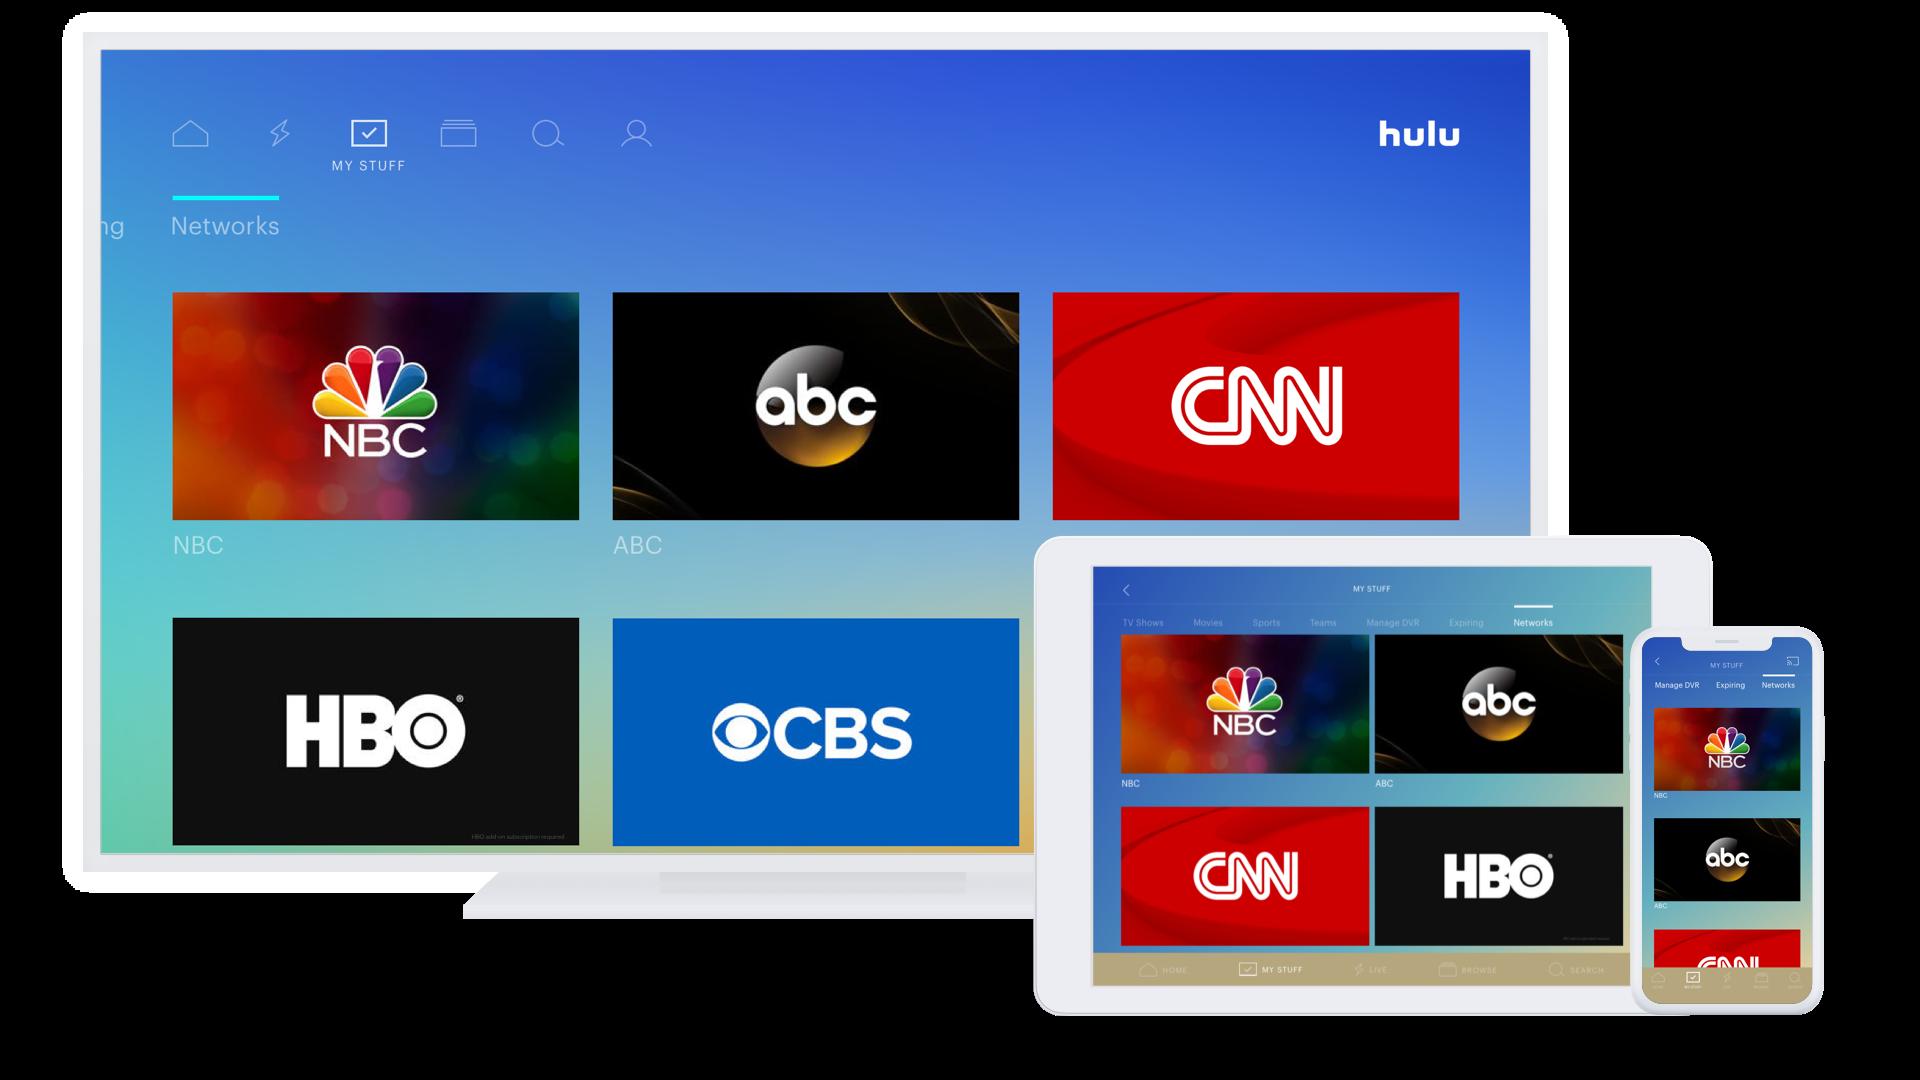 DIS-Hulu-channels